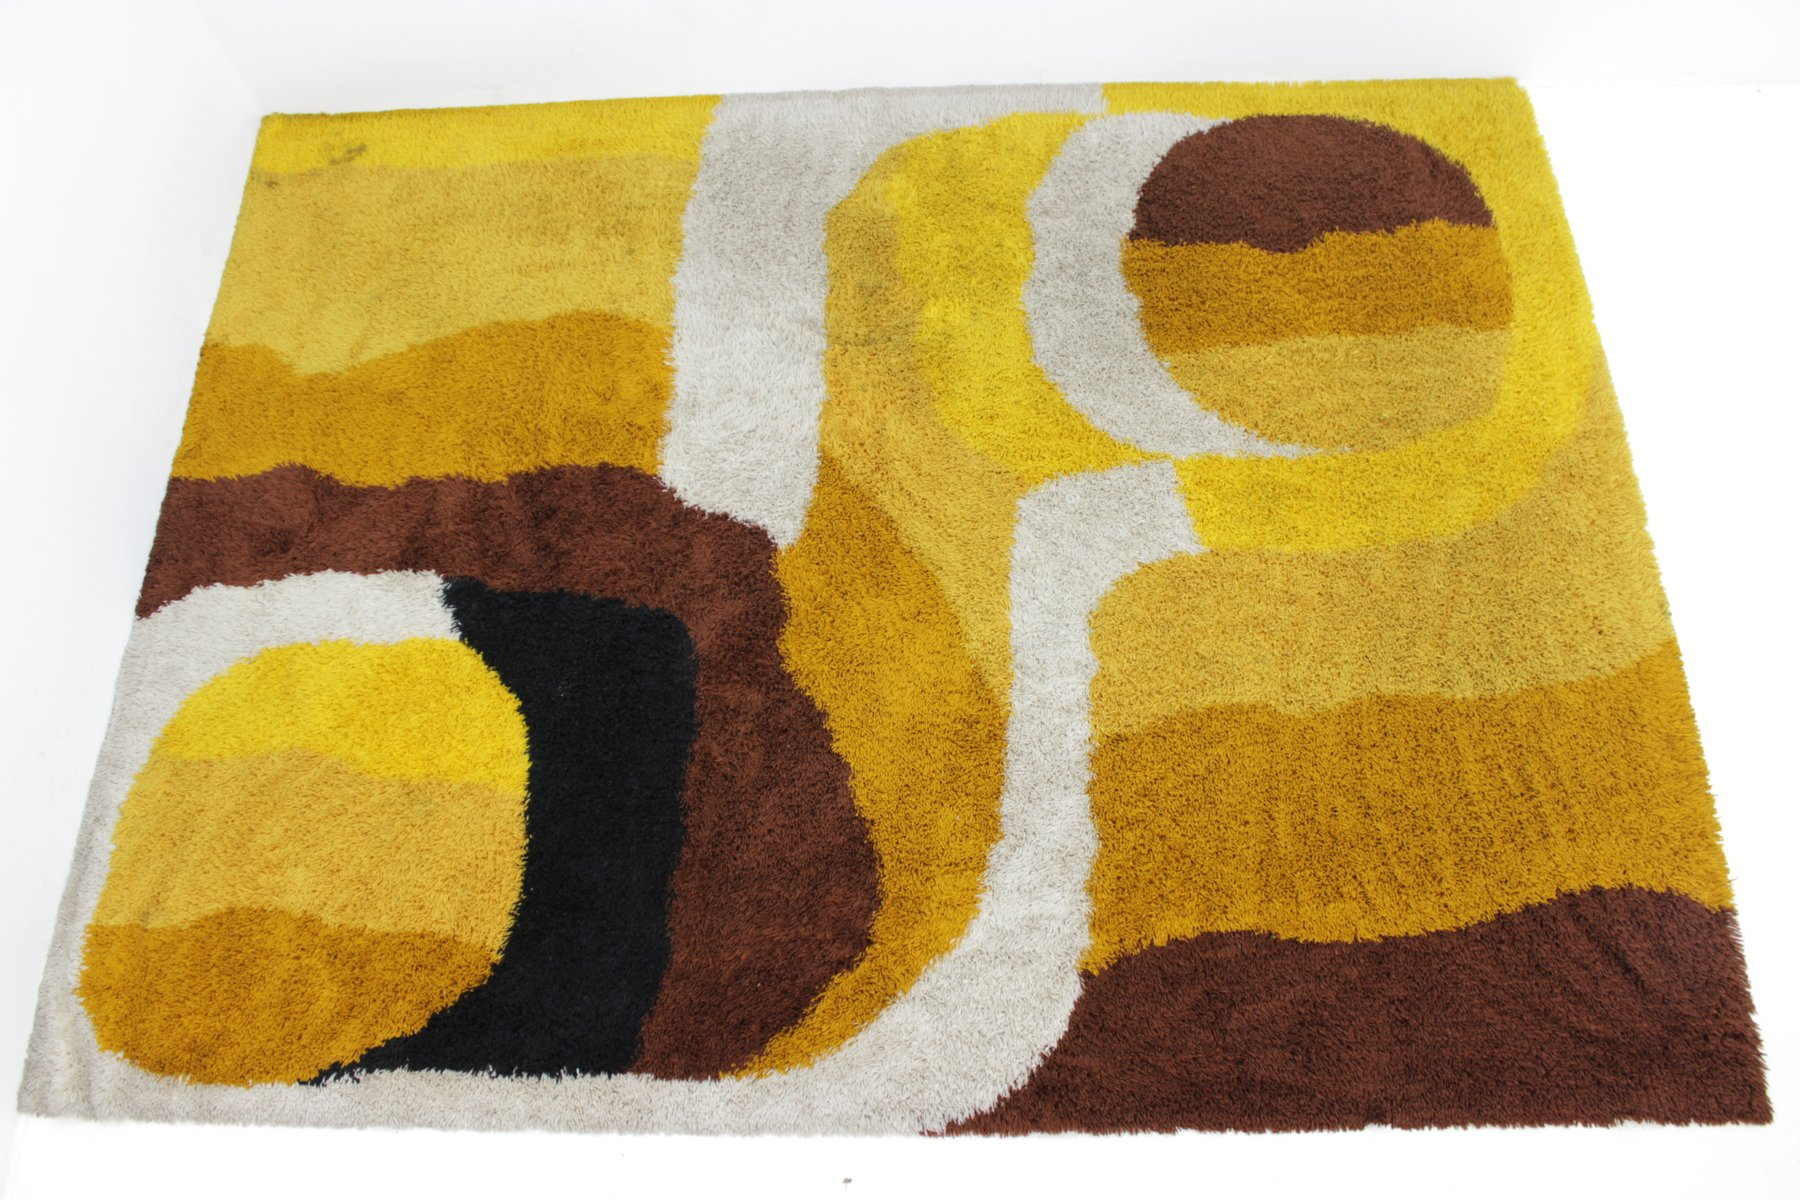 gro er skandinavischer mid century teppich 1960er bei. Black Bedroom Furniture Sets. Home Design Ideas